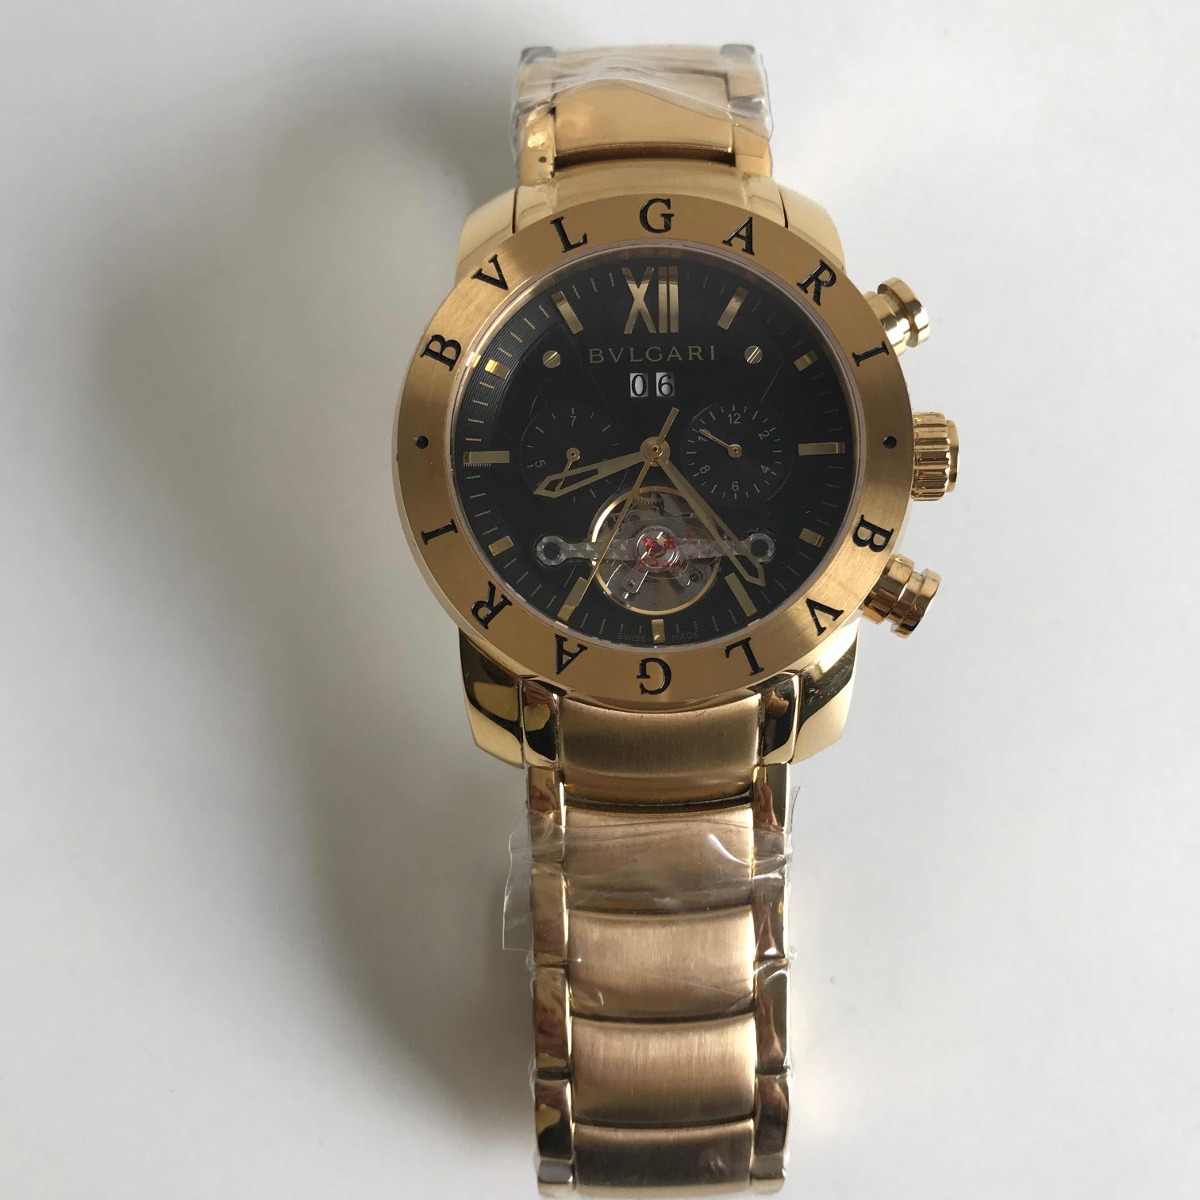 8022cfc0aaa Relógio Bvlgari Iron Man Dourado Automático